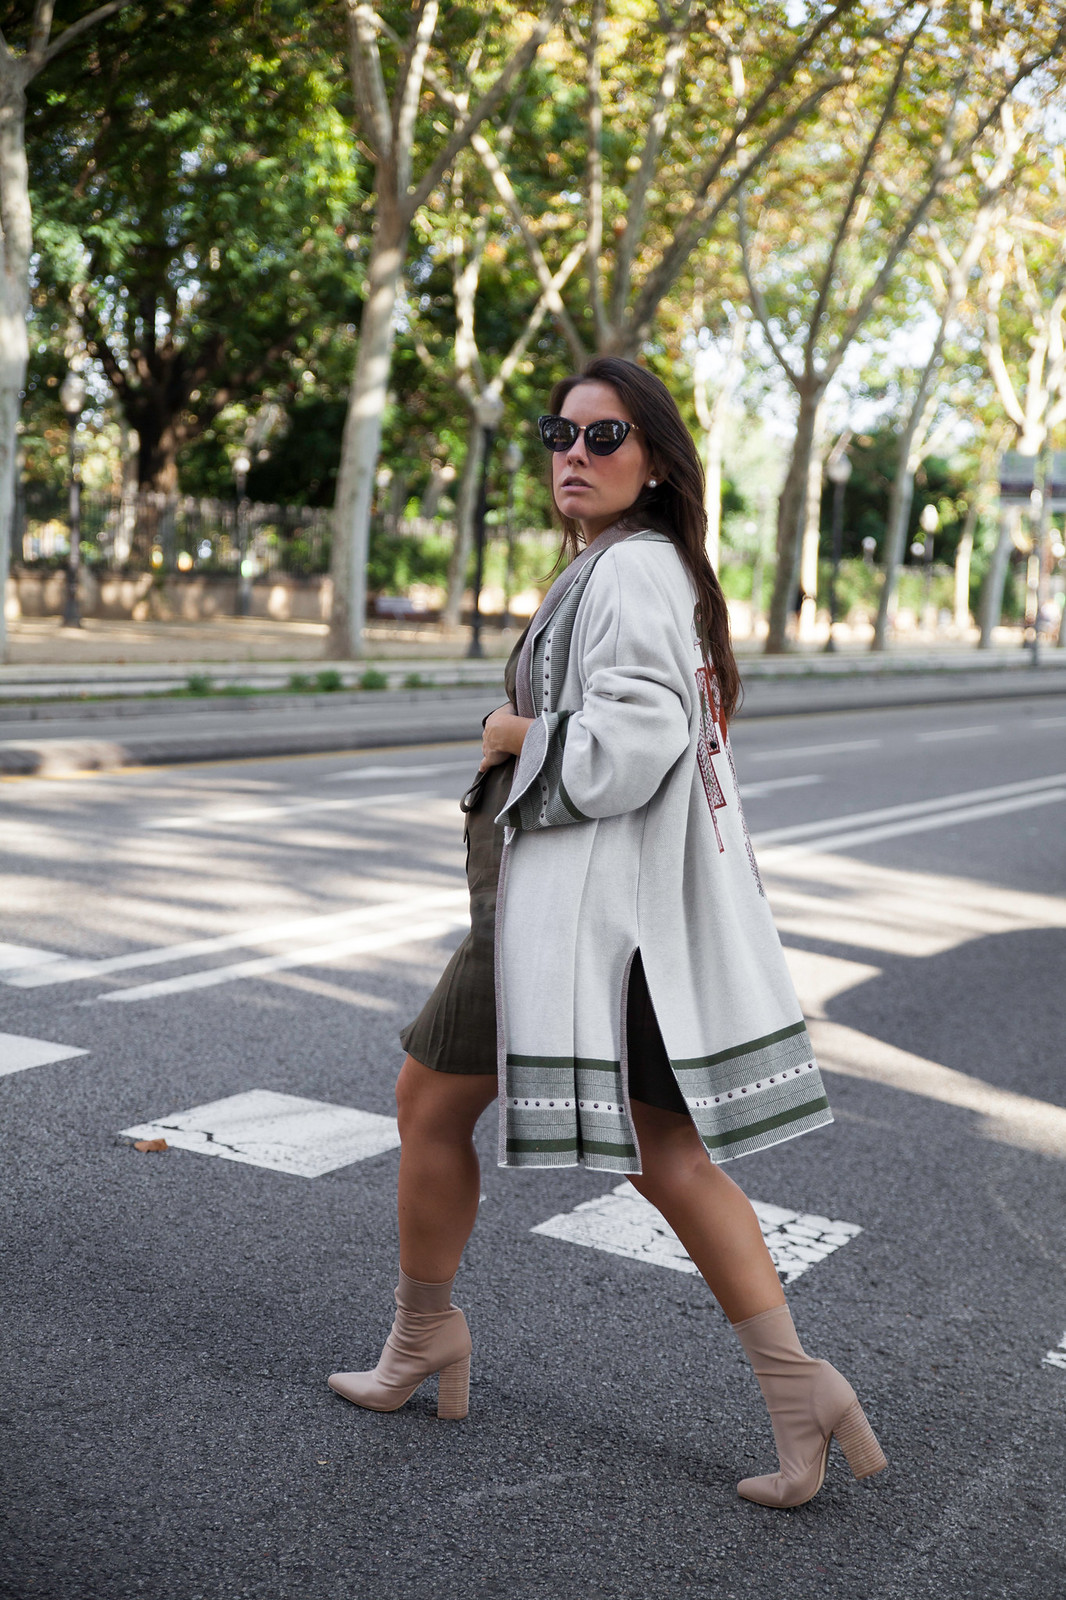 04_Como_combinar_un_cardigan_khaki_etnico_otoño_theguestgirl_rüga_laura_santolaira_influencer_embarazada_fashion_street_style_barcelona